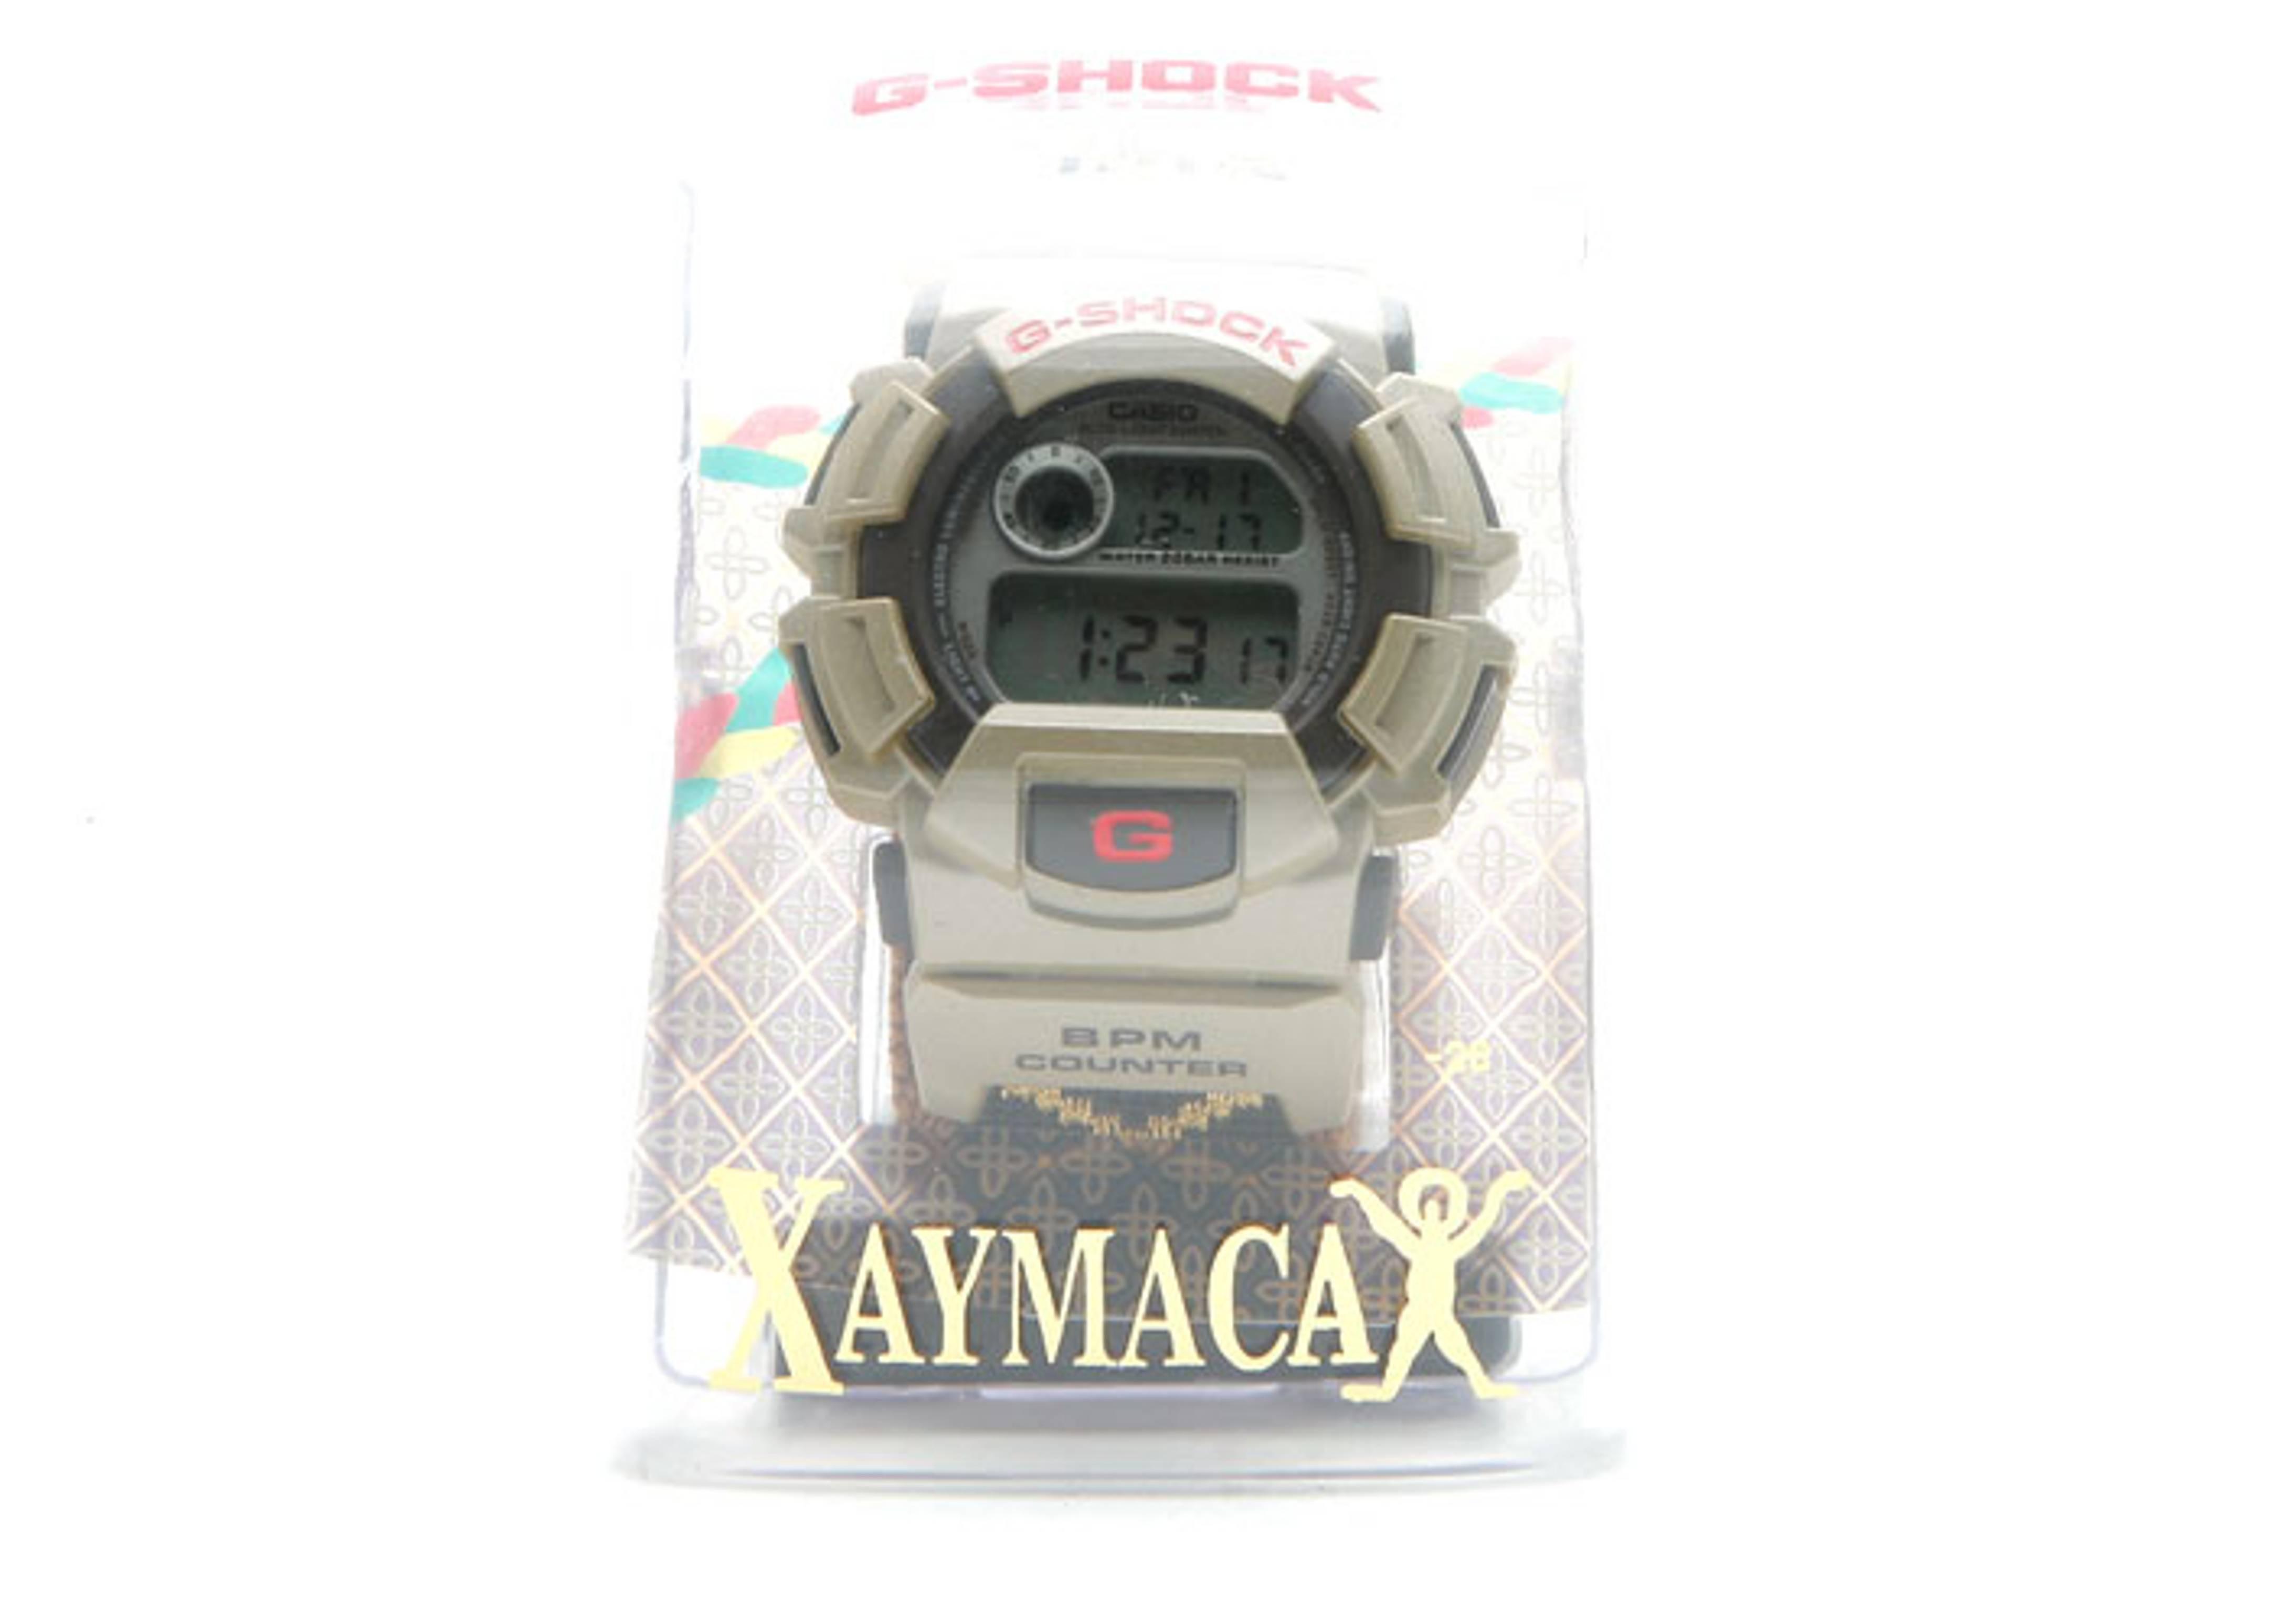 g-shock dw9550rx9t